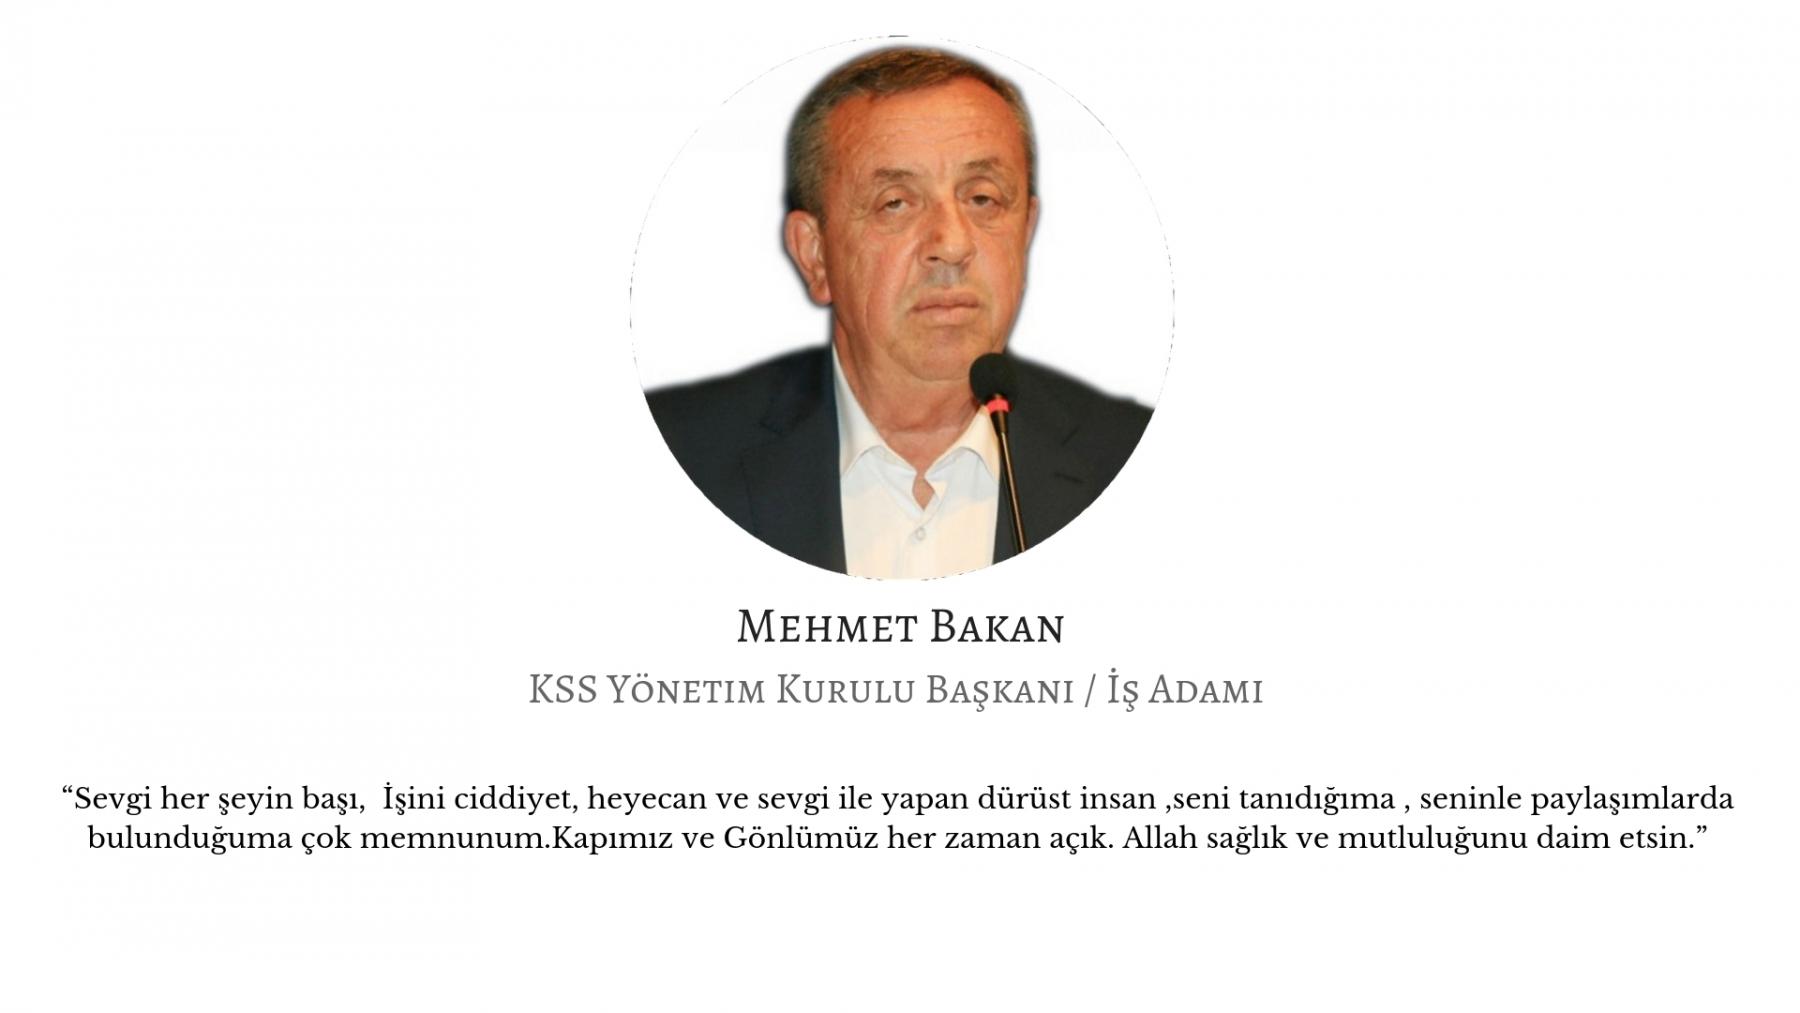 Mehmet Bakan yasin ozkan mma bjj izmir jiujitsu muay thai fitness pt